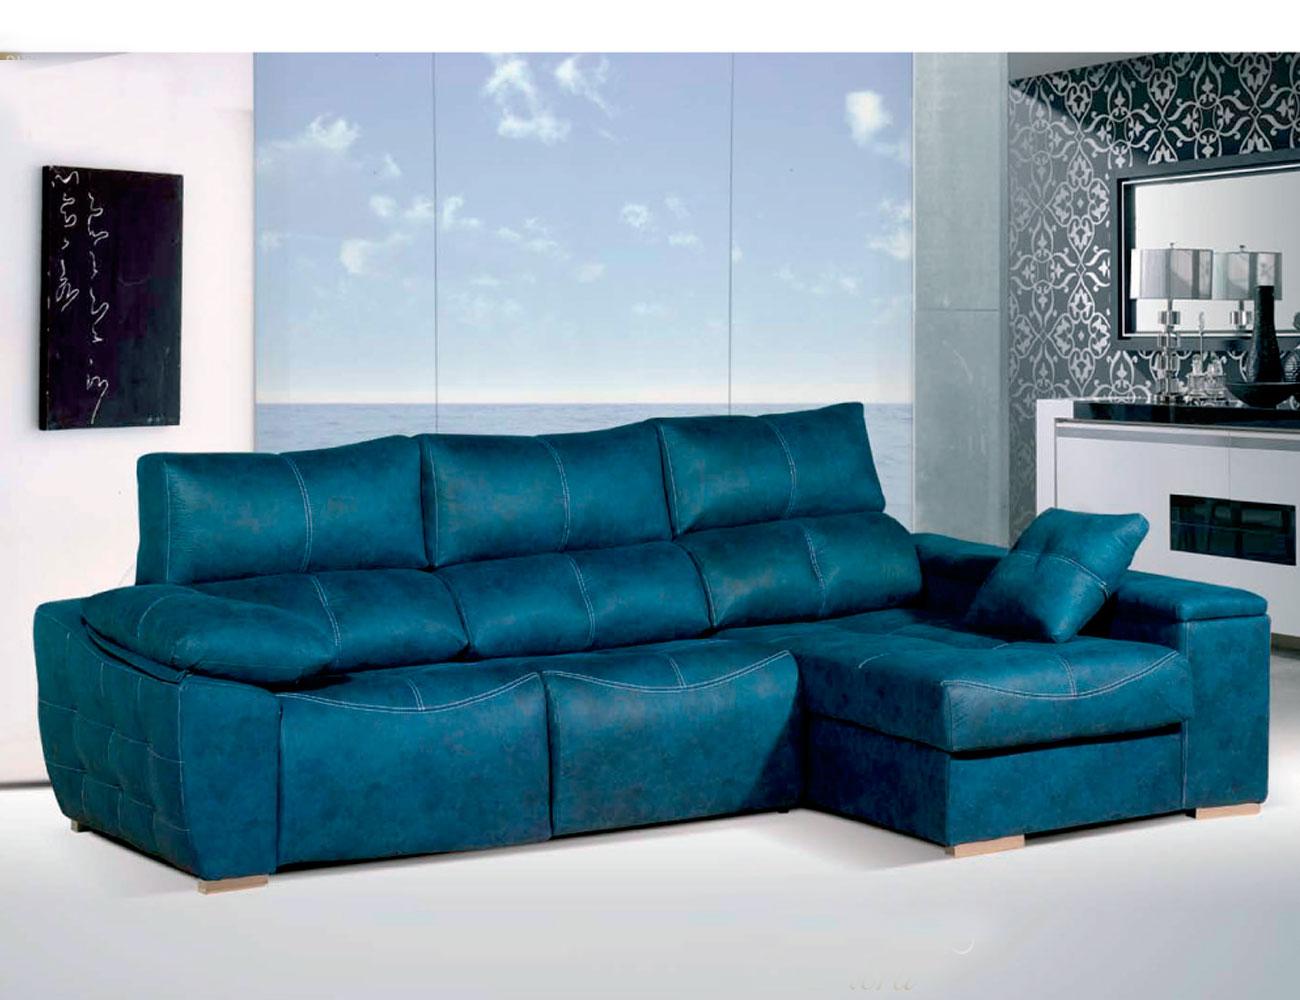 Sofa chaiselongue relax 2 motores anti manchas turquesa2